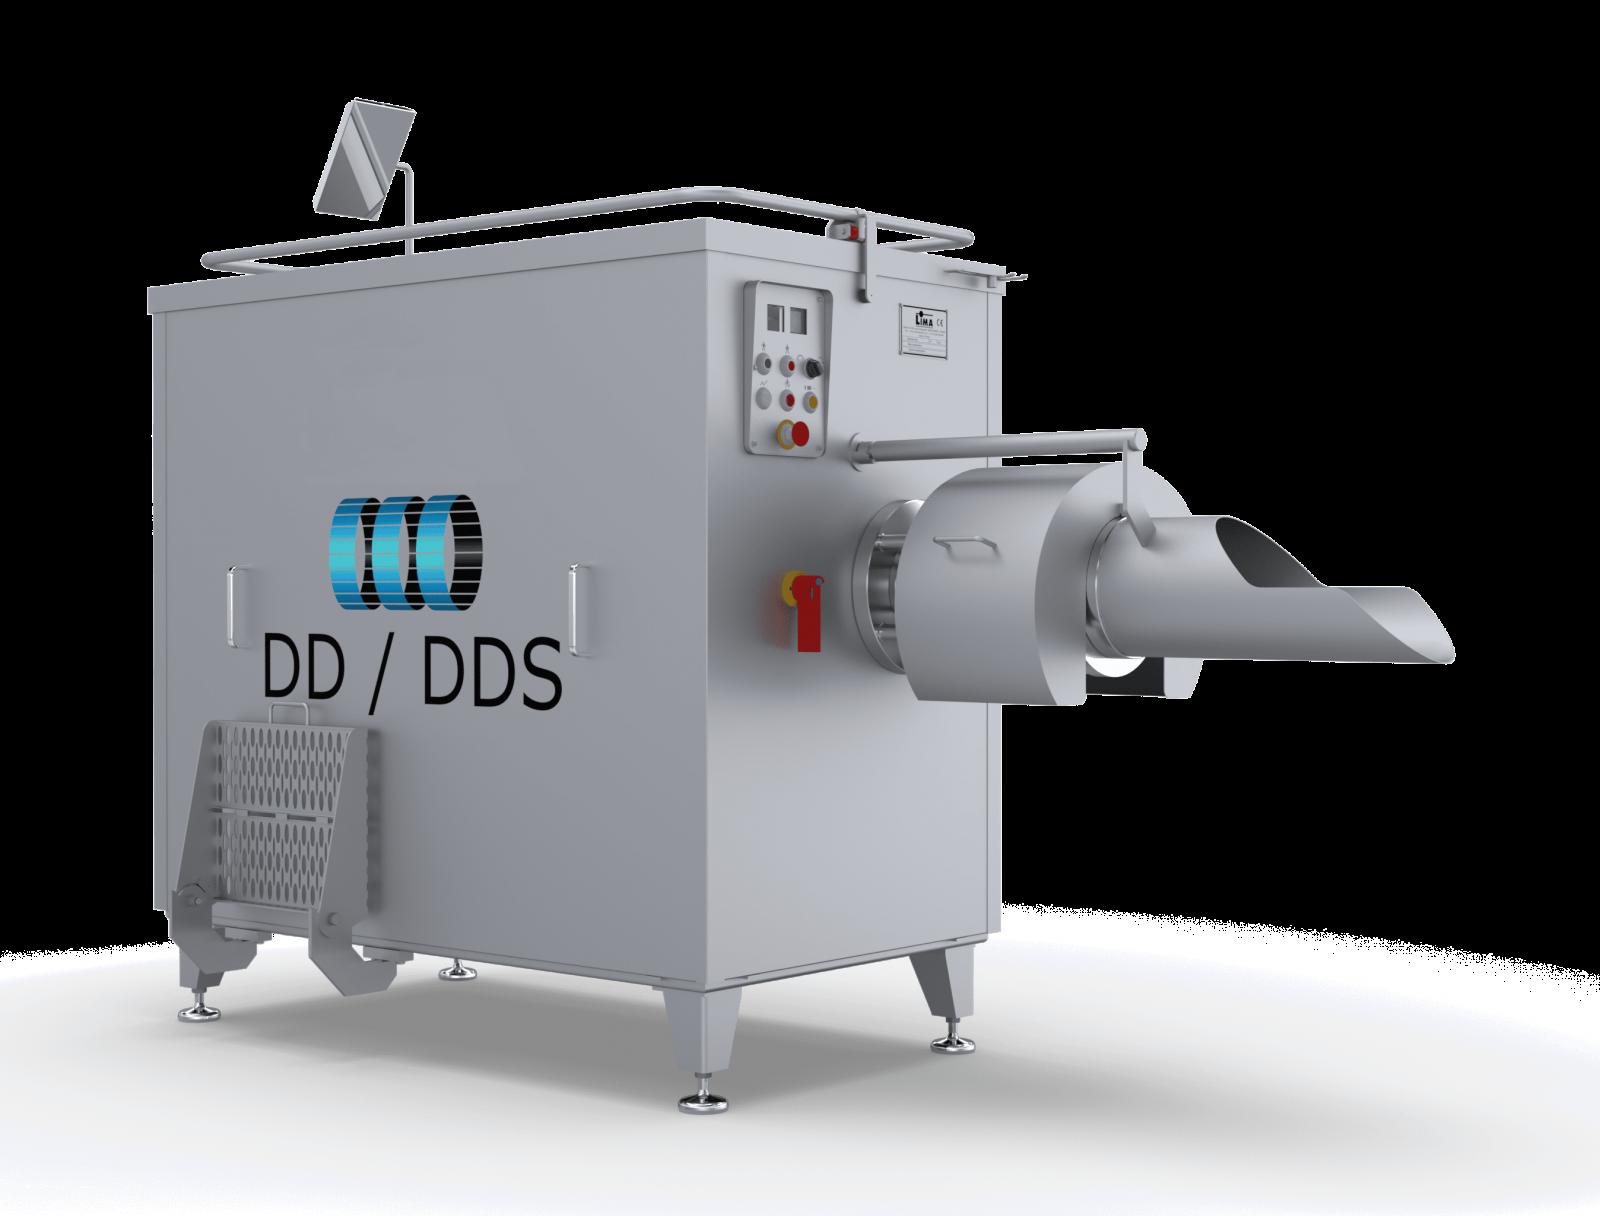 Entbeiner/Entsehner DD/DDS & DDM/DDSM Baureihe